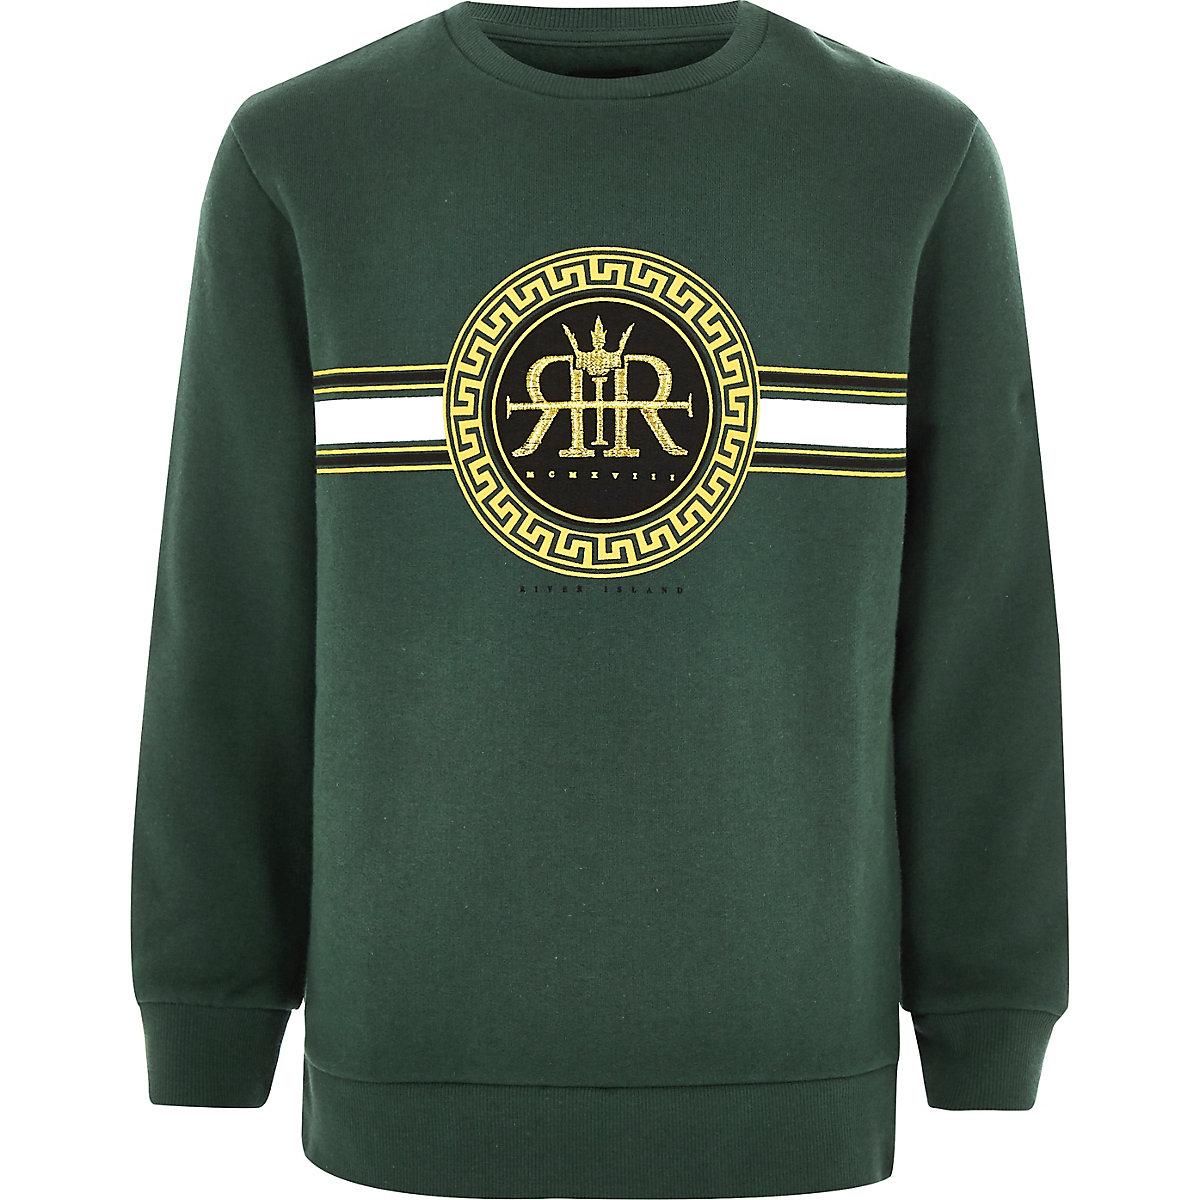 Boys green RI embroidered sweatshirt